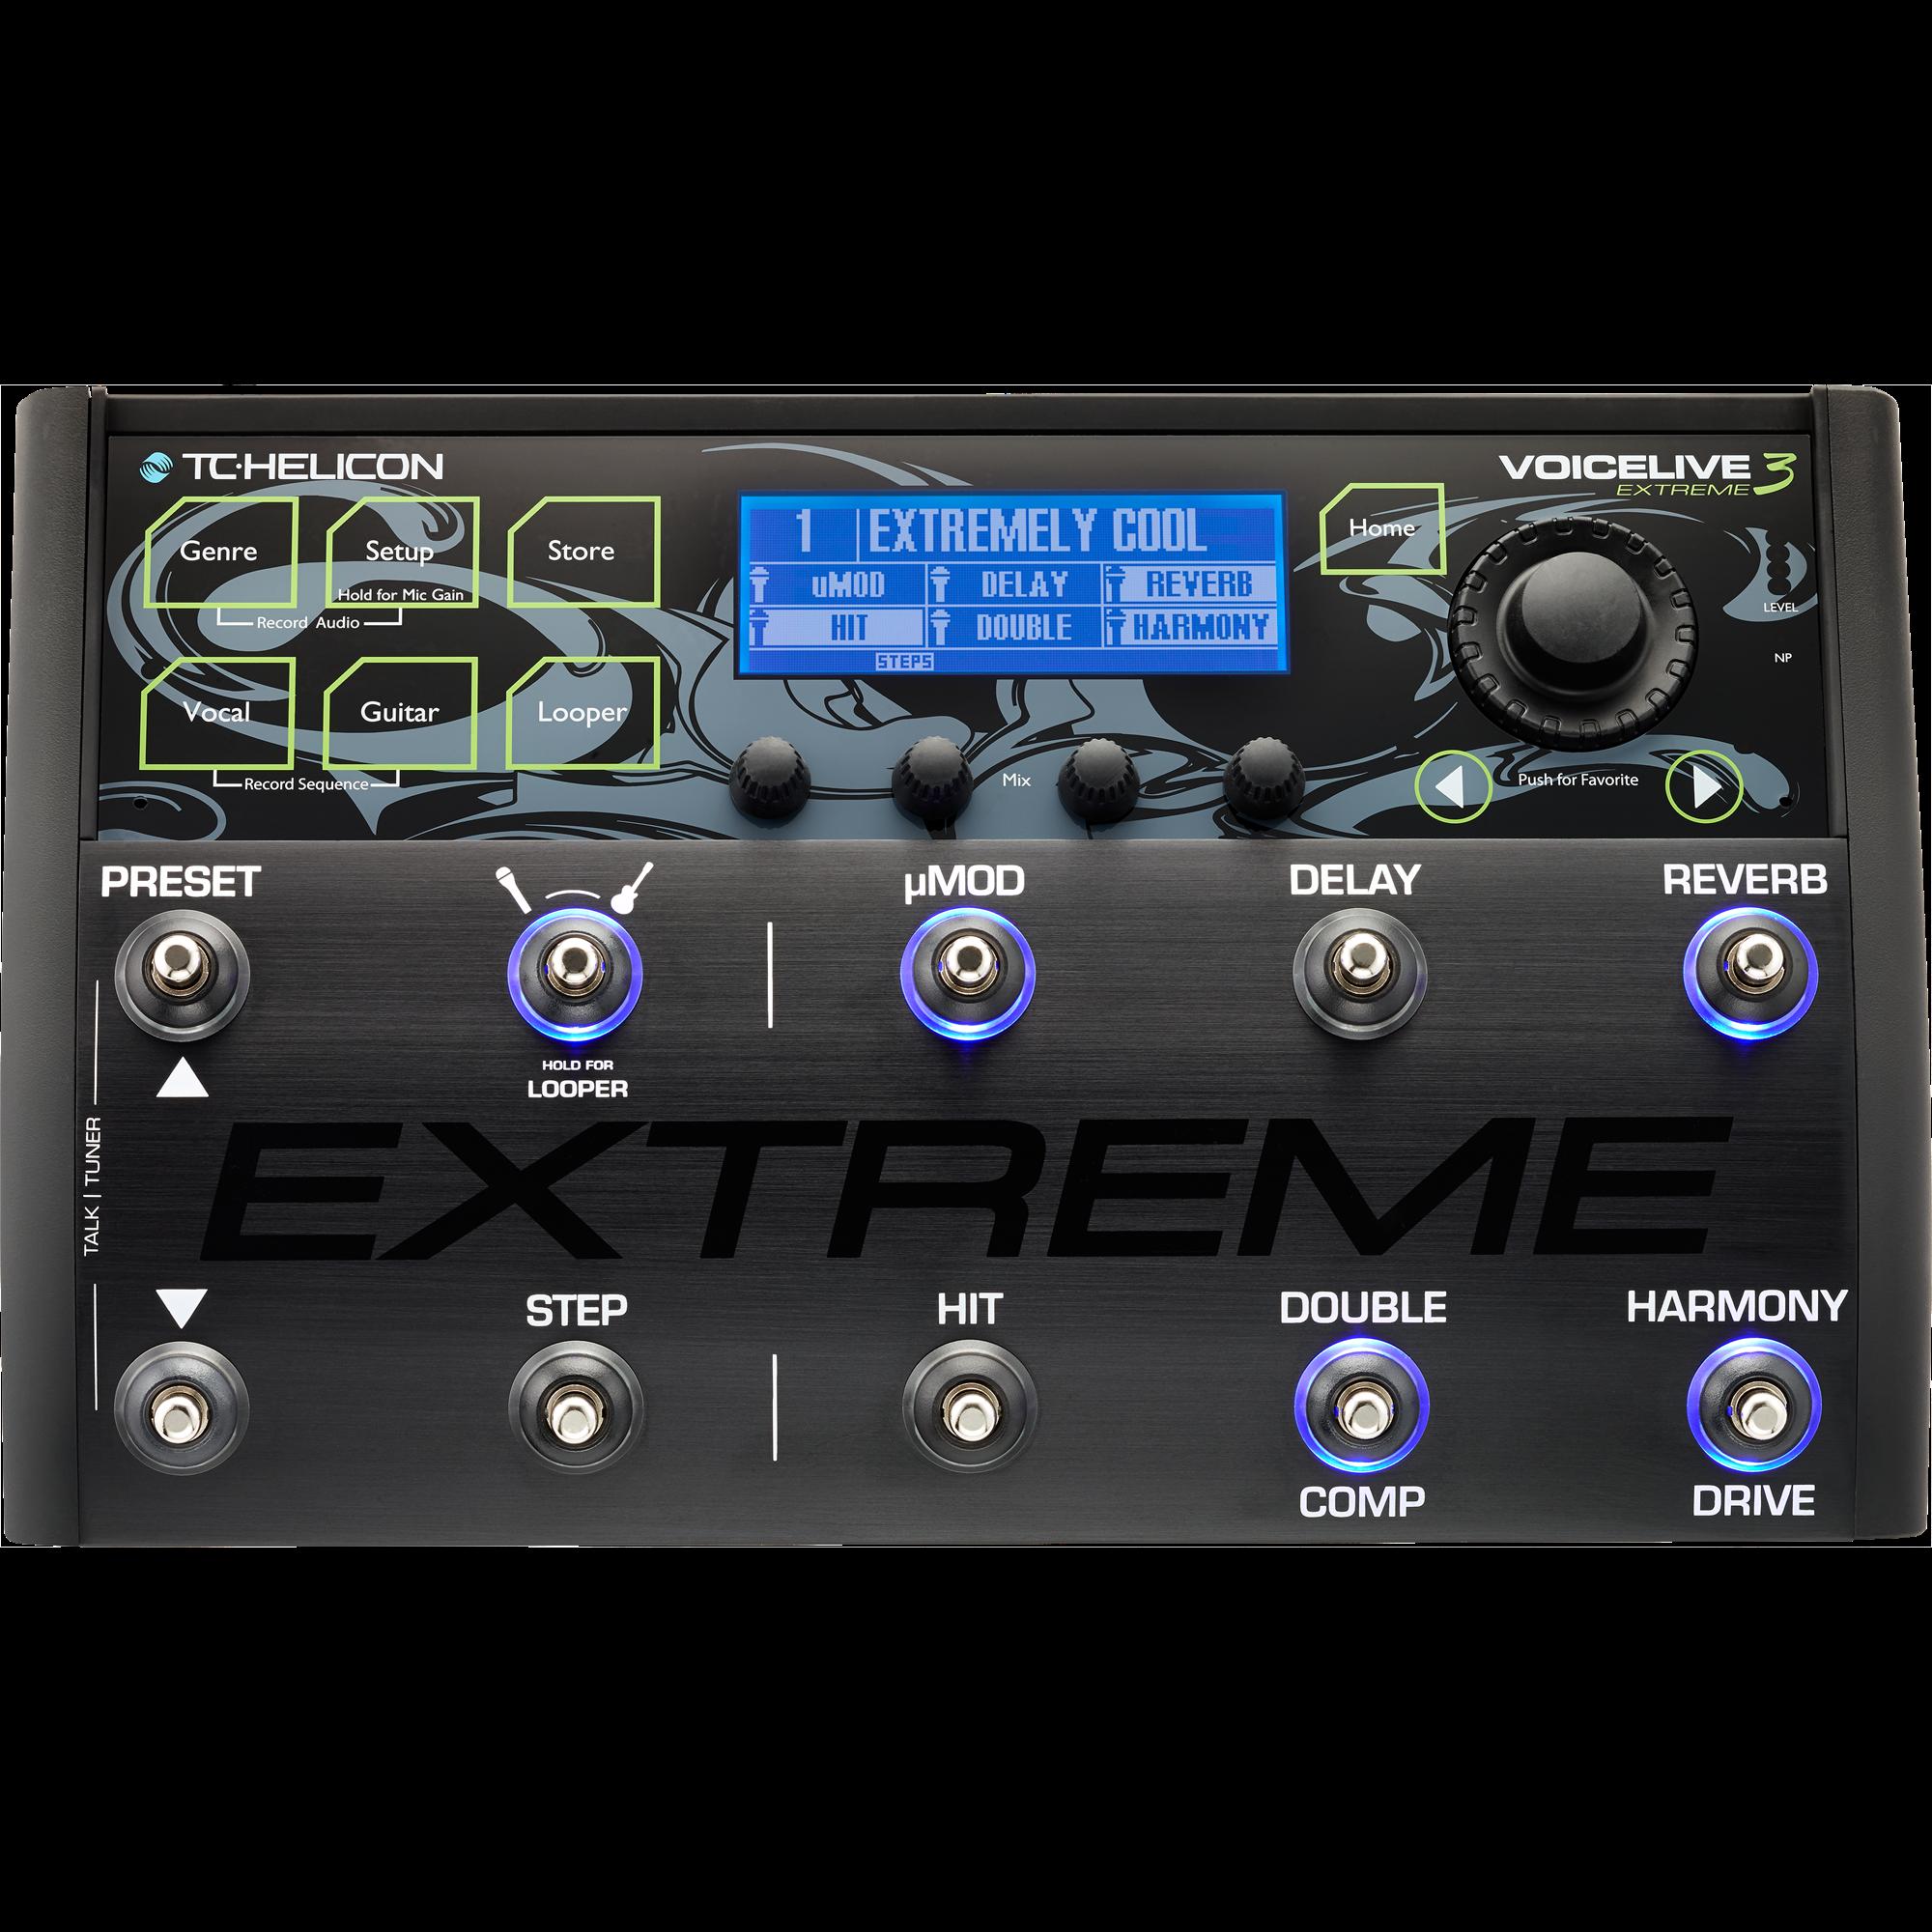 1-tch-voicelive-3-extreme-front-vocal